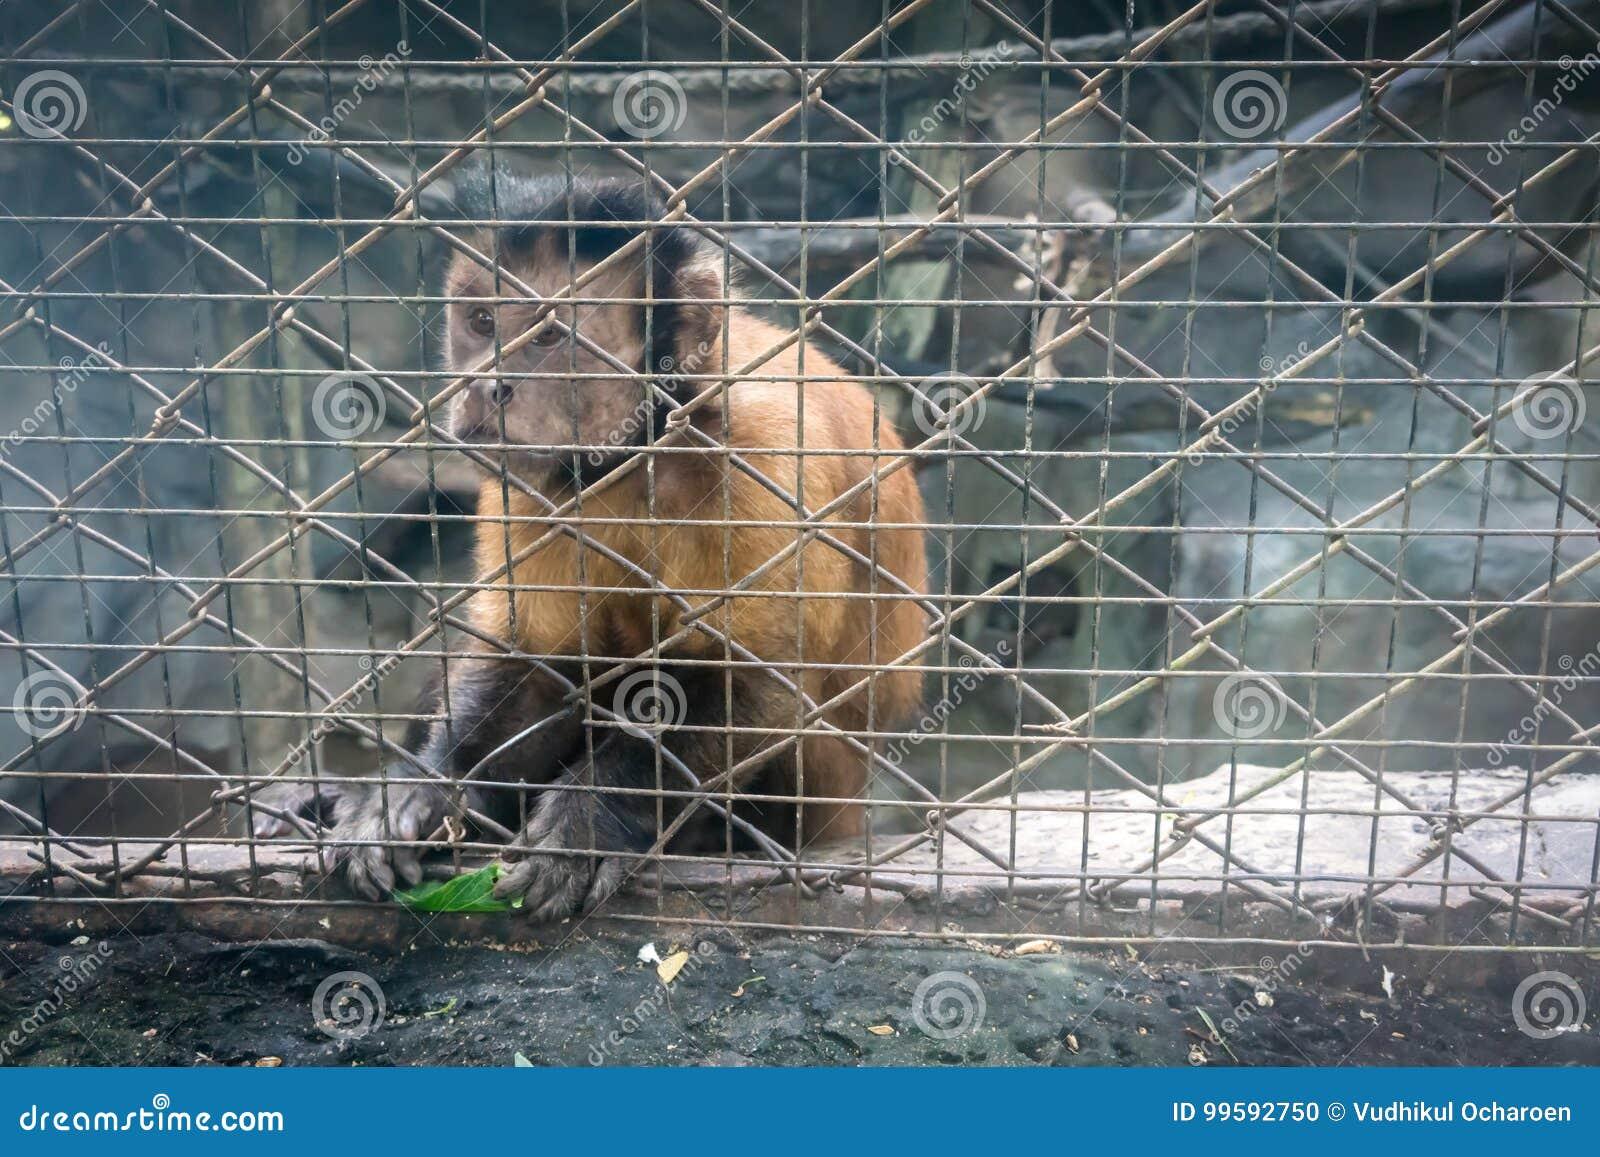 Обезьяна сидя в клетке зоопарка